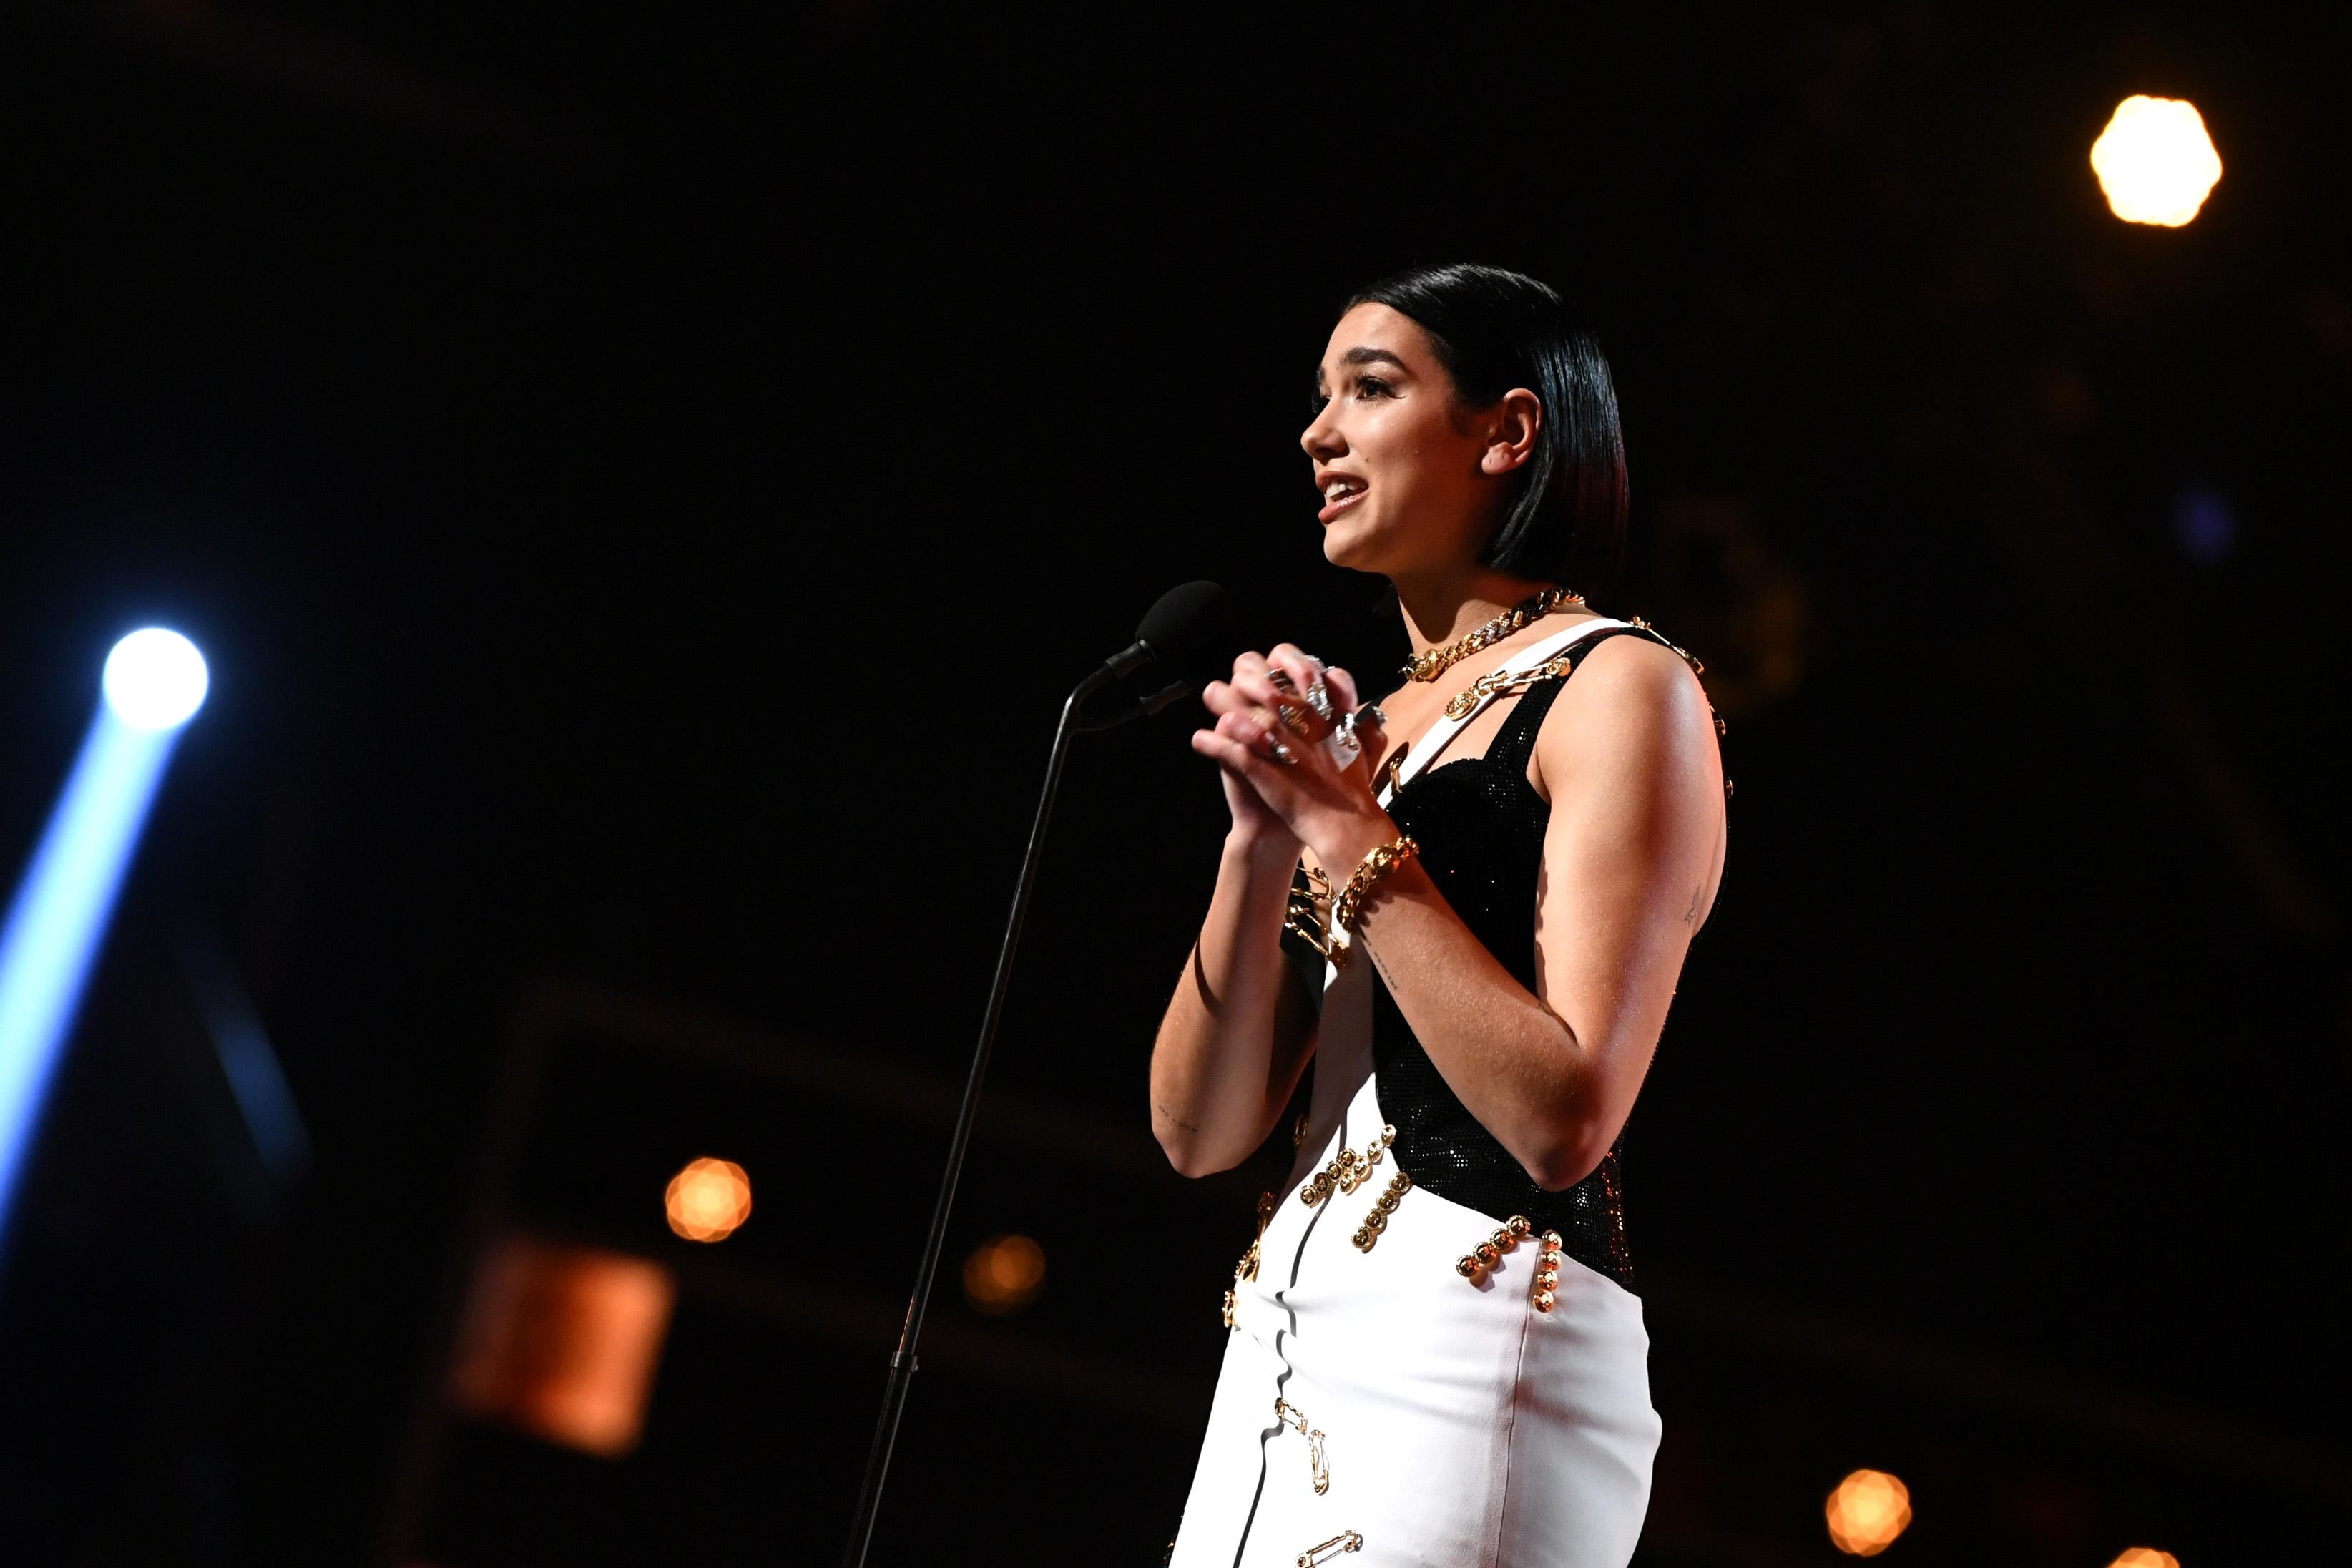 Dua Lipa accepts the Grammy for best new artist.